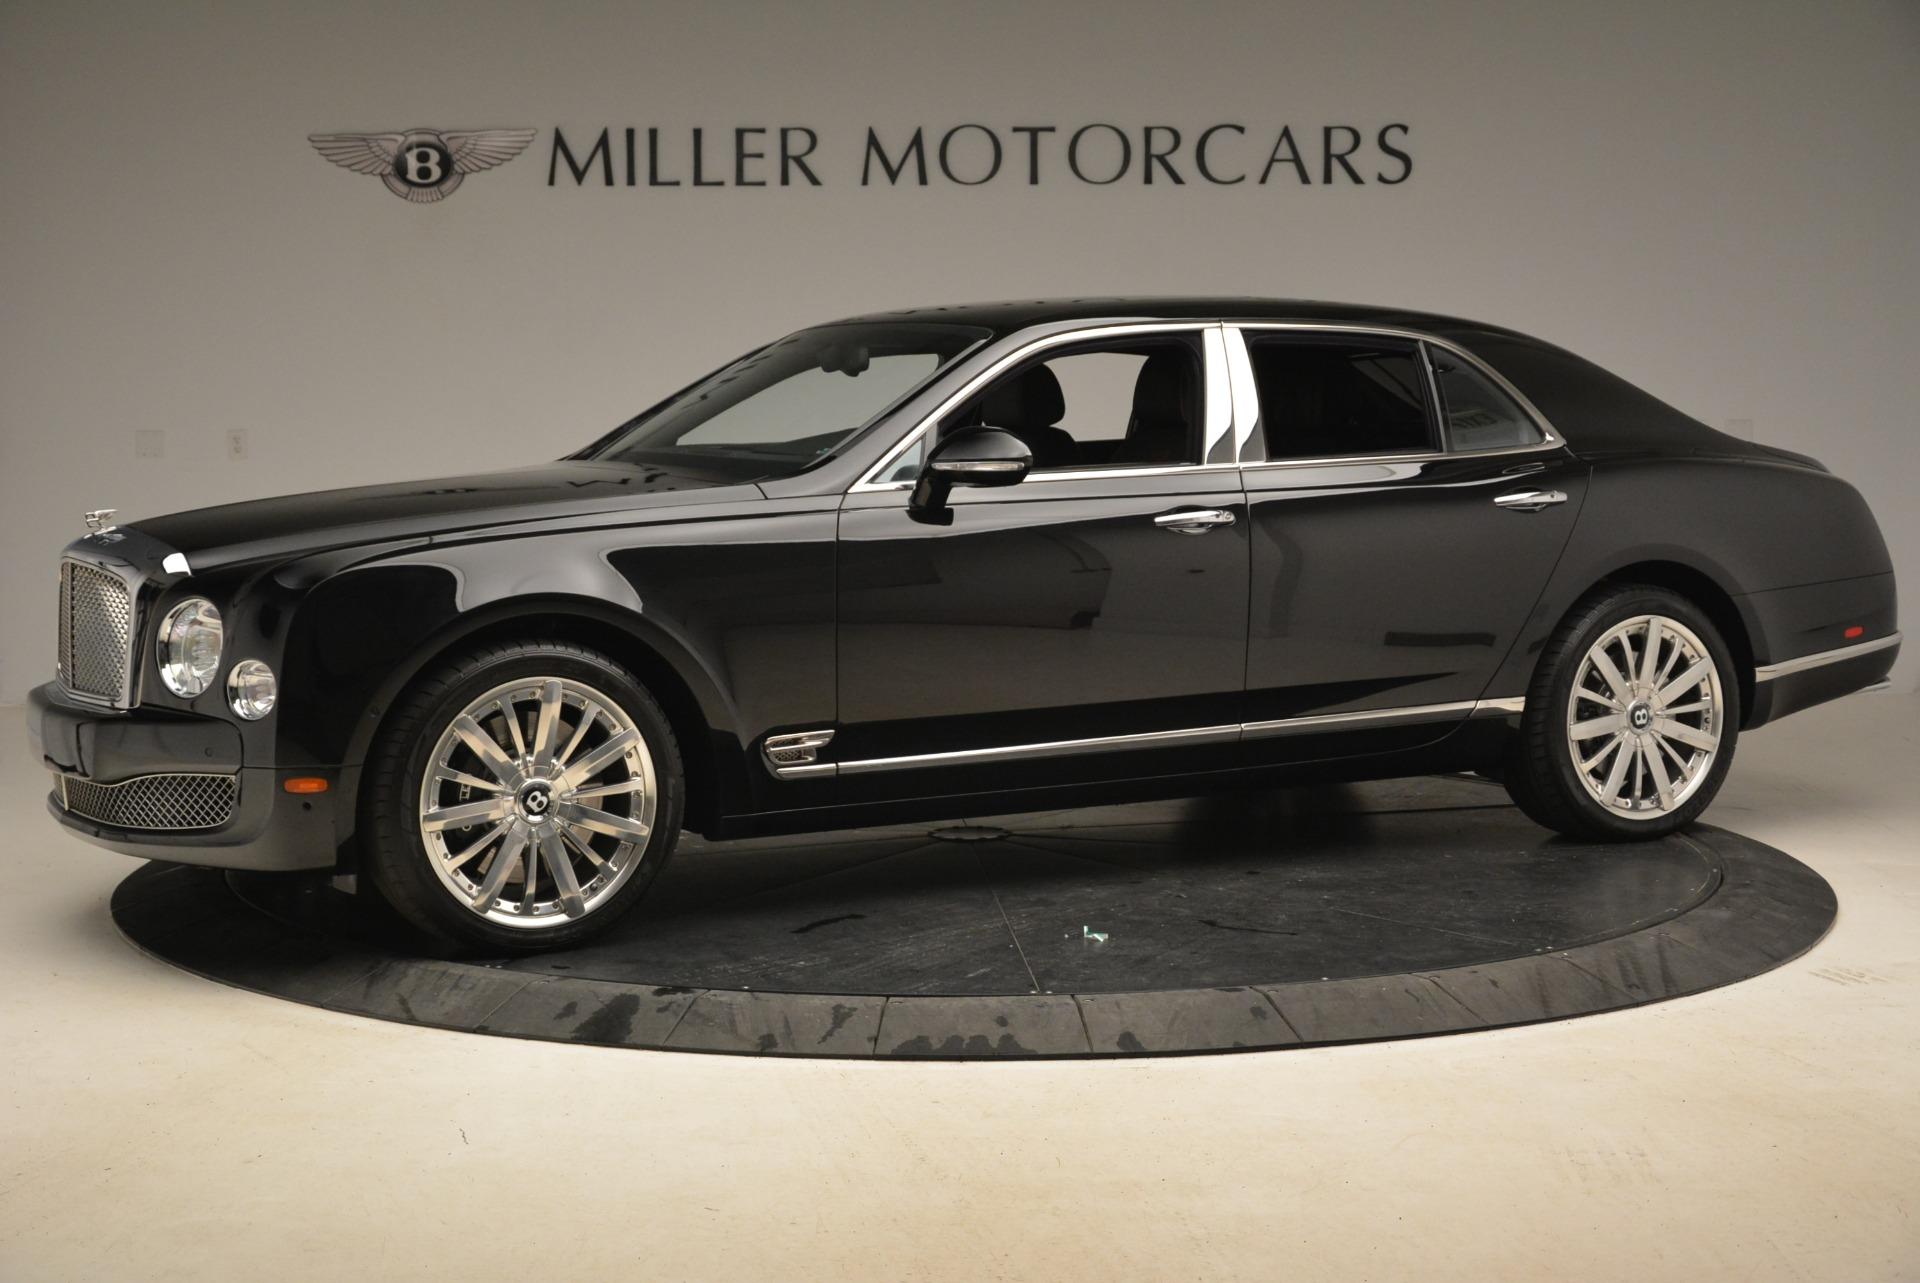 Used 2016 Bentley Mulsanne  For Sale In Westport, CT 2189_p2